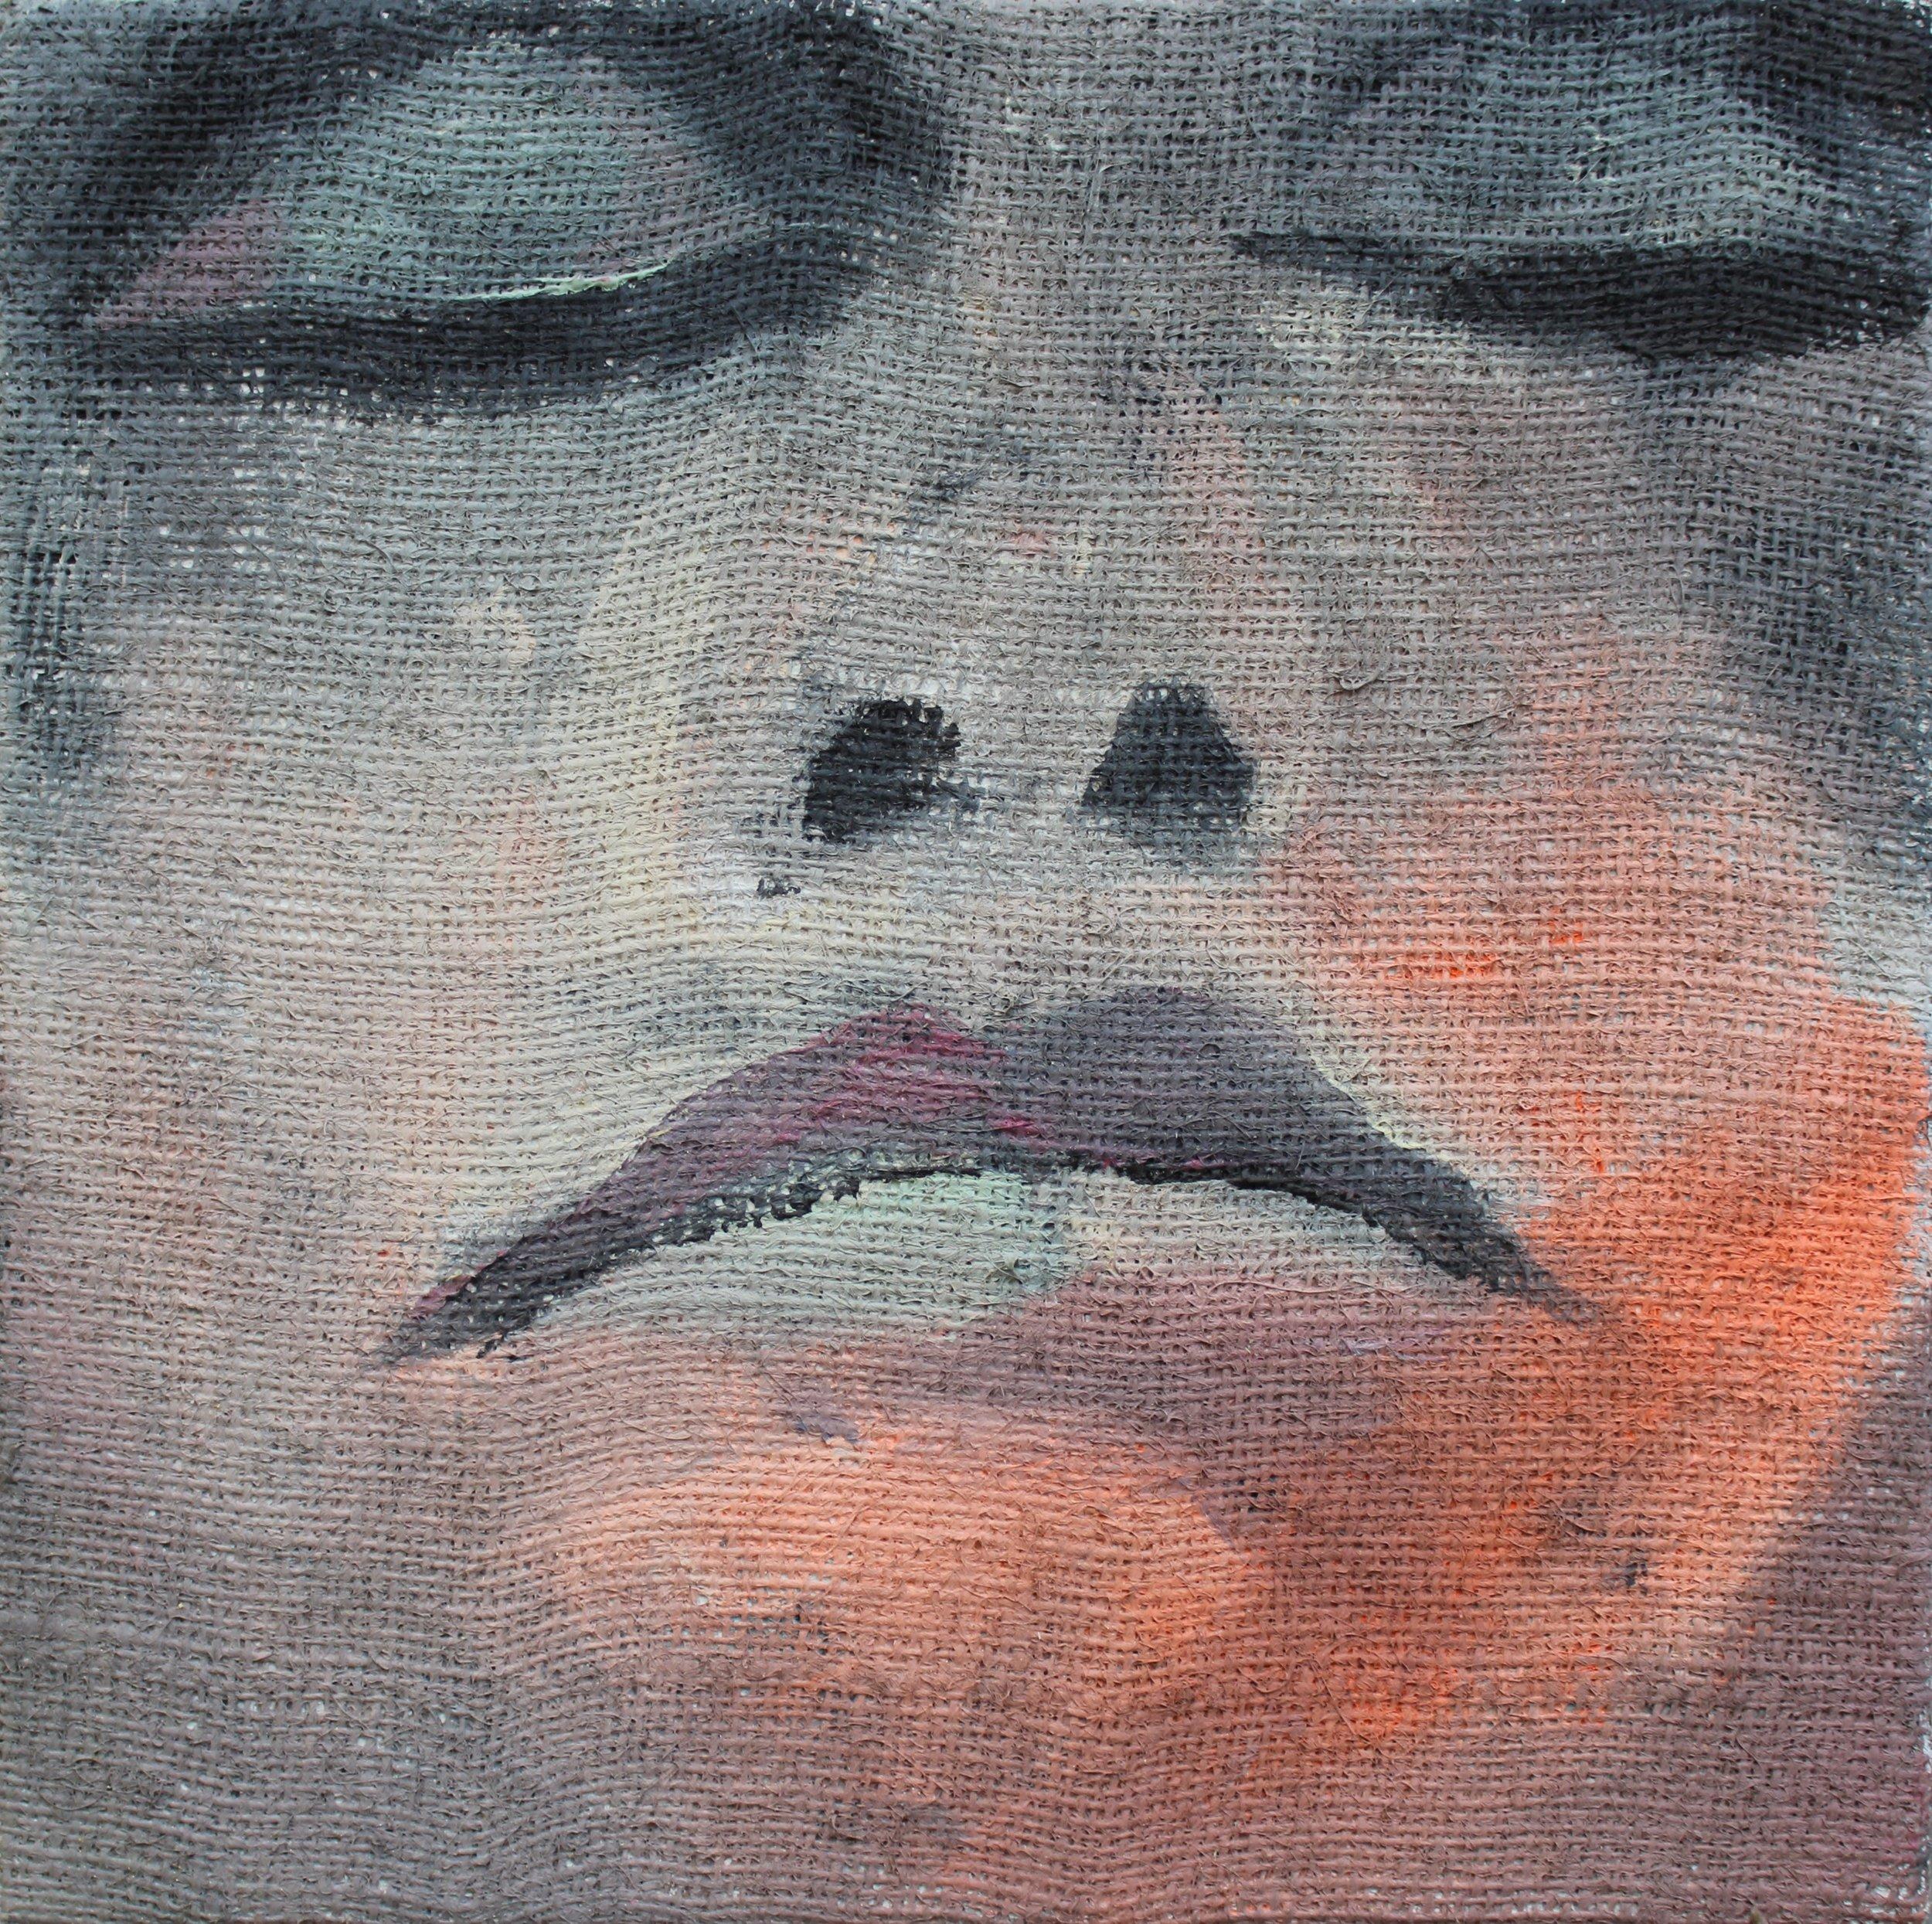 "How Do You Feel Today?   acrylic on burlap  14"" x 14""  2018   AVAILABLE"